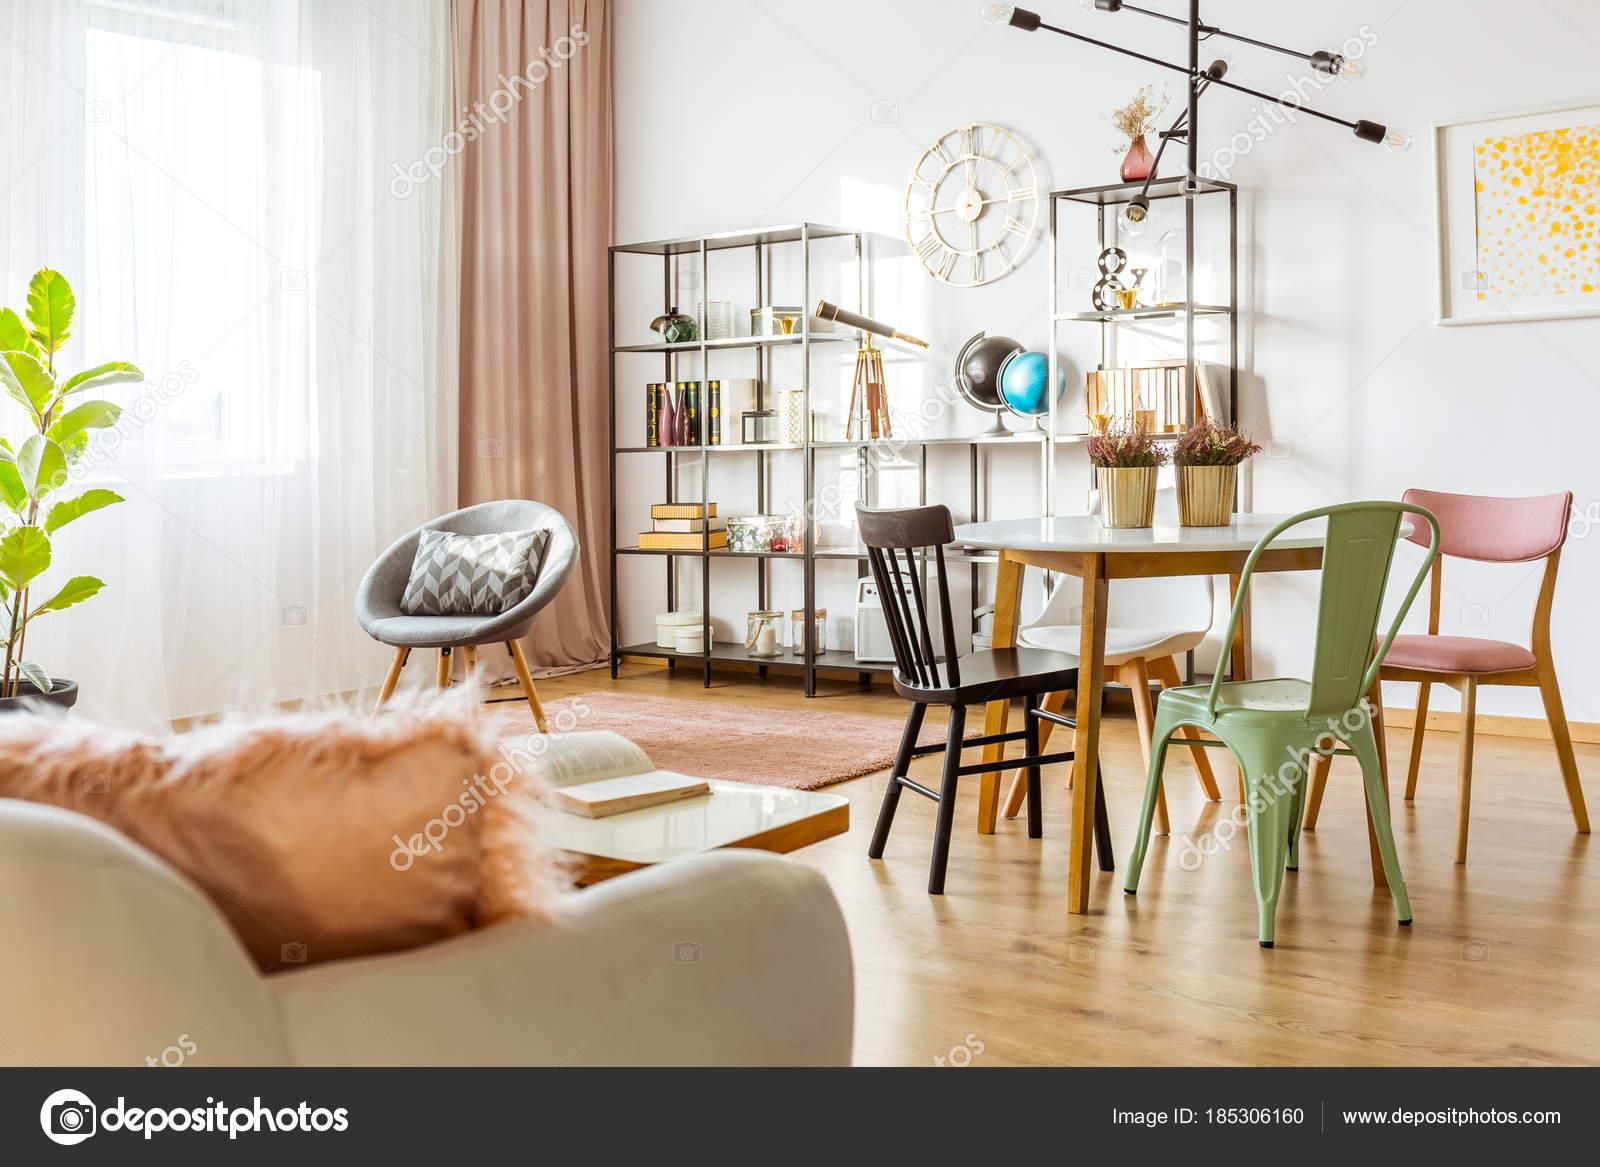 Kleurrijke Interieurs Pastel : Gezellige pastel woonkamer u2014 stockfoto © photographee.eu #185306160